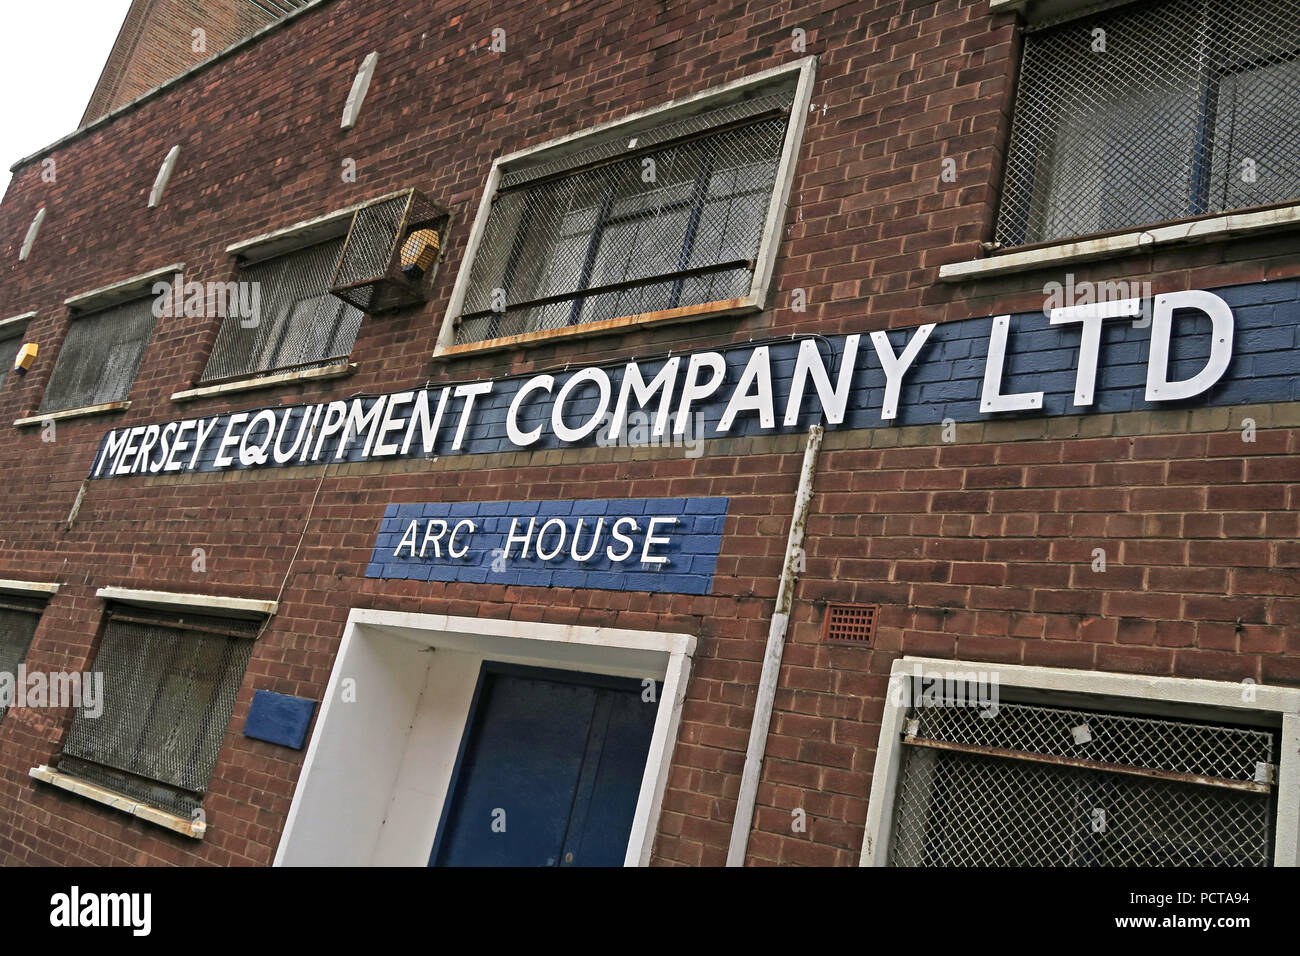 GoTonySmith,@HotpixUK,UK,Welding supplies,Supplies,building,entrance,outside,exterior